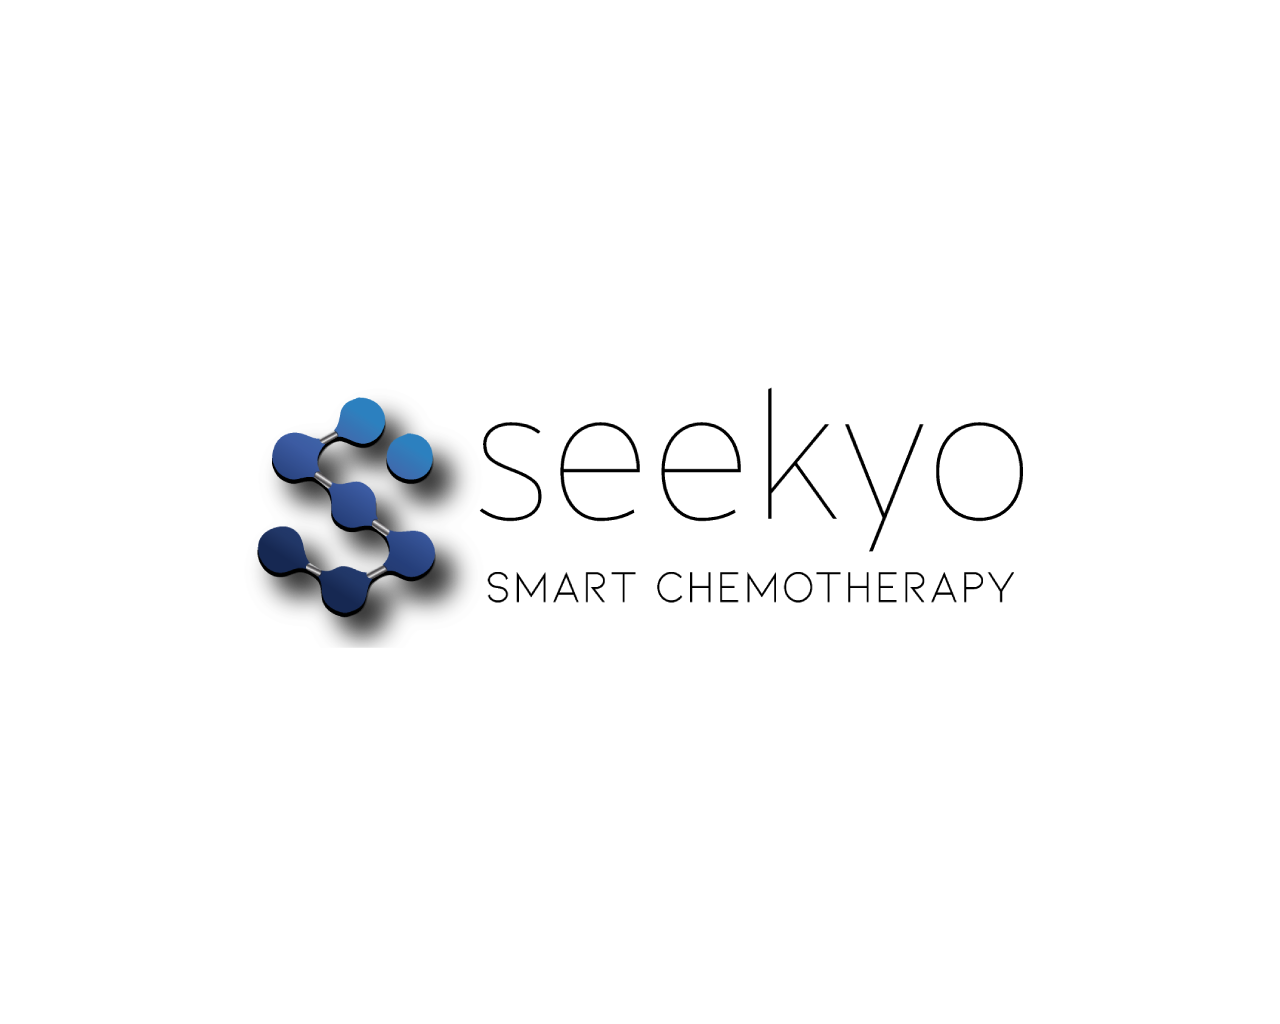 Logo Seekyo - Smart Chemotherapy